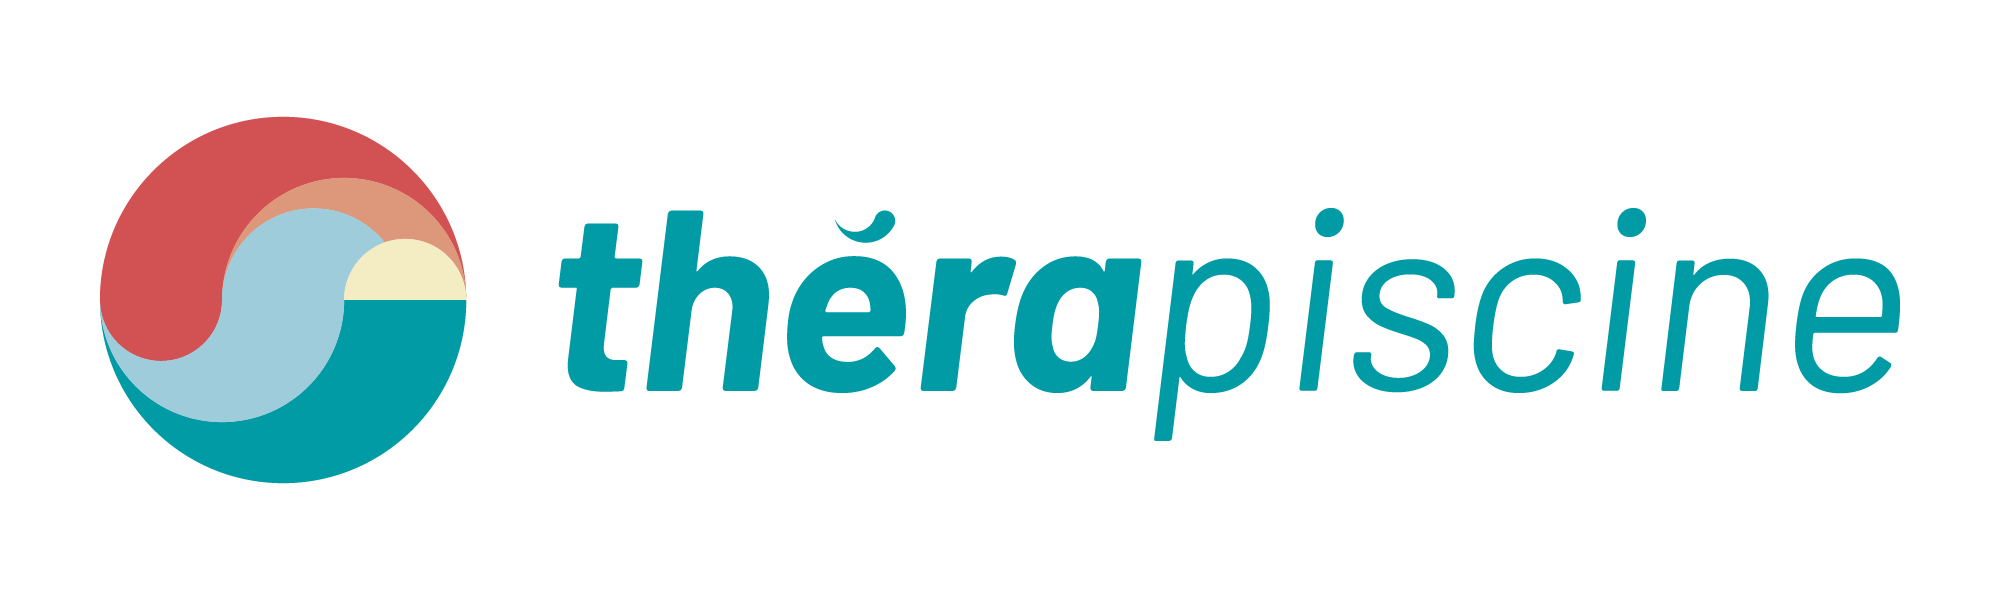 Thérapiscine